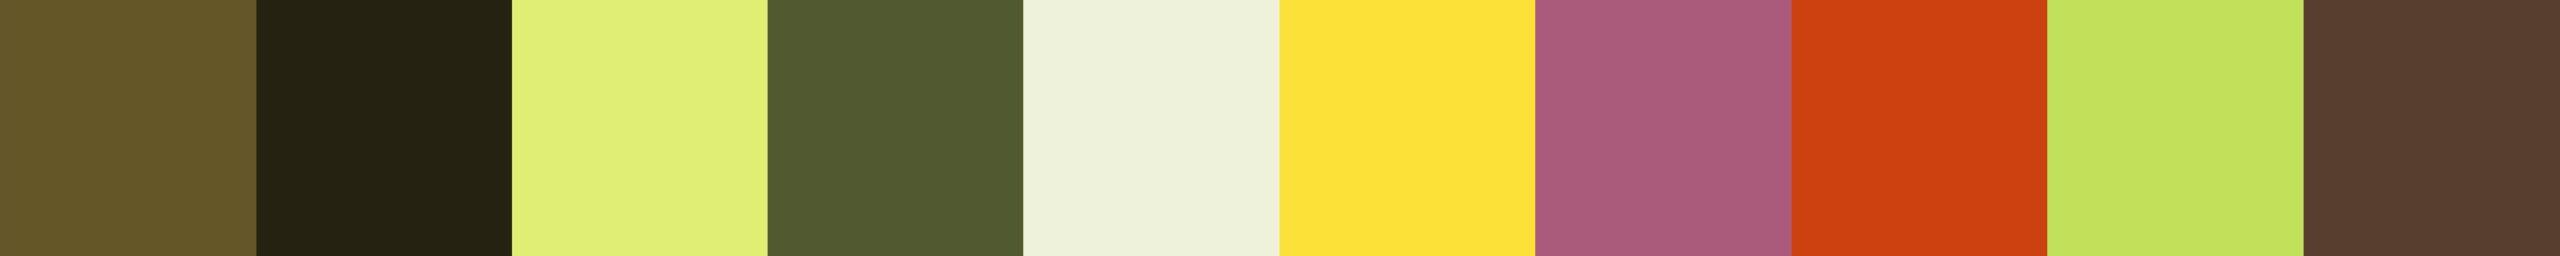 32 Reniae Color Palette